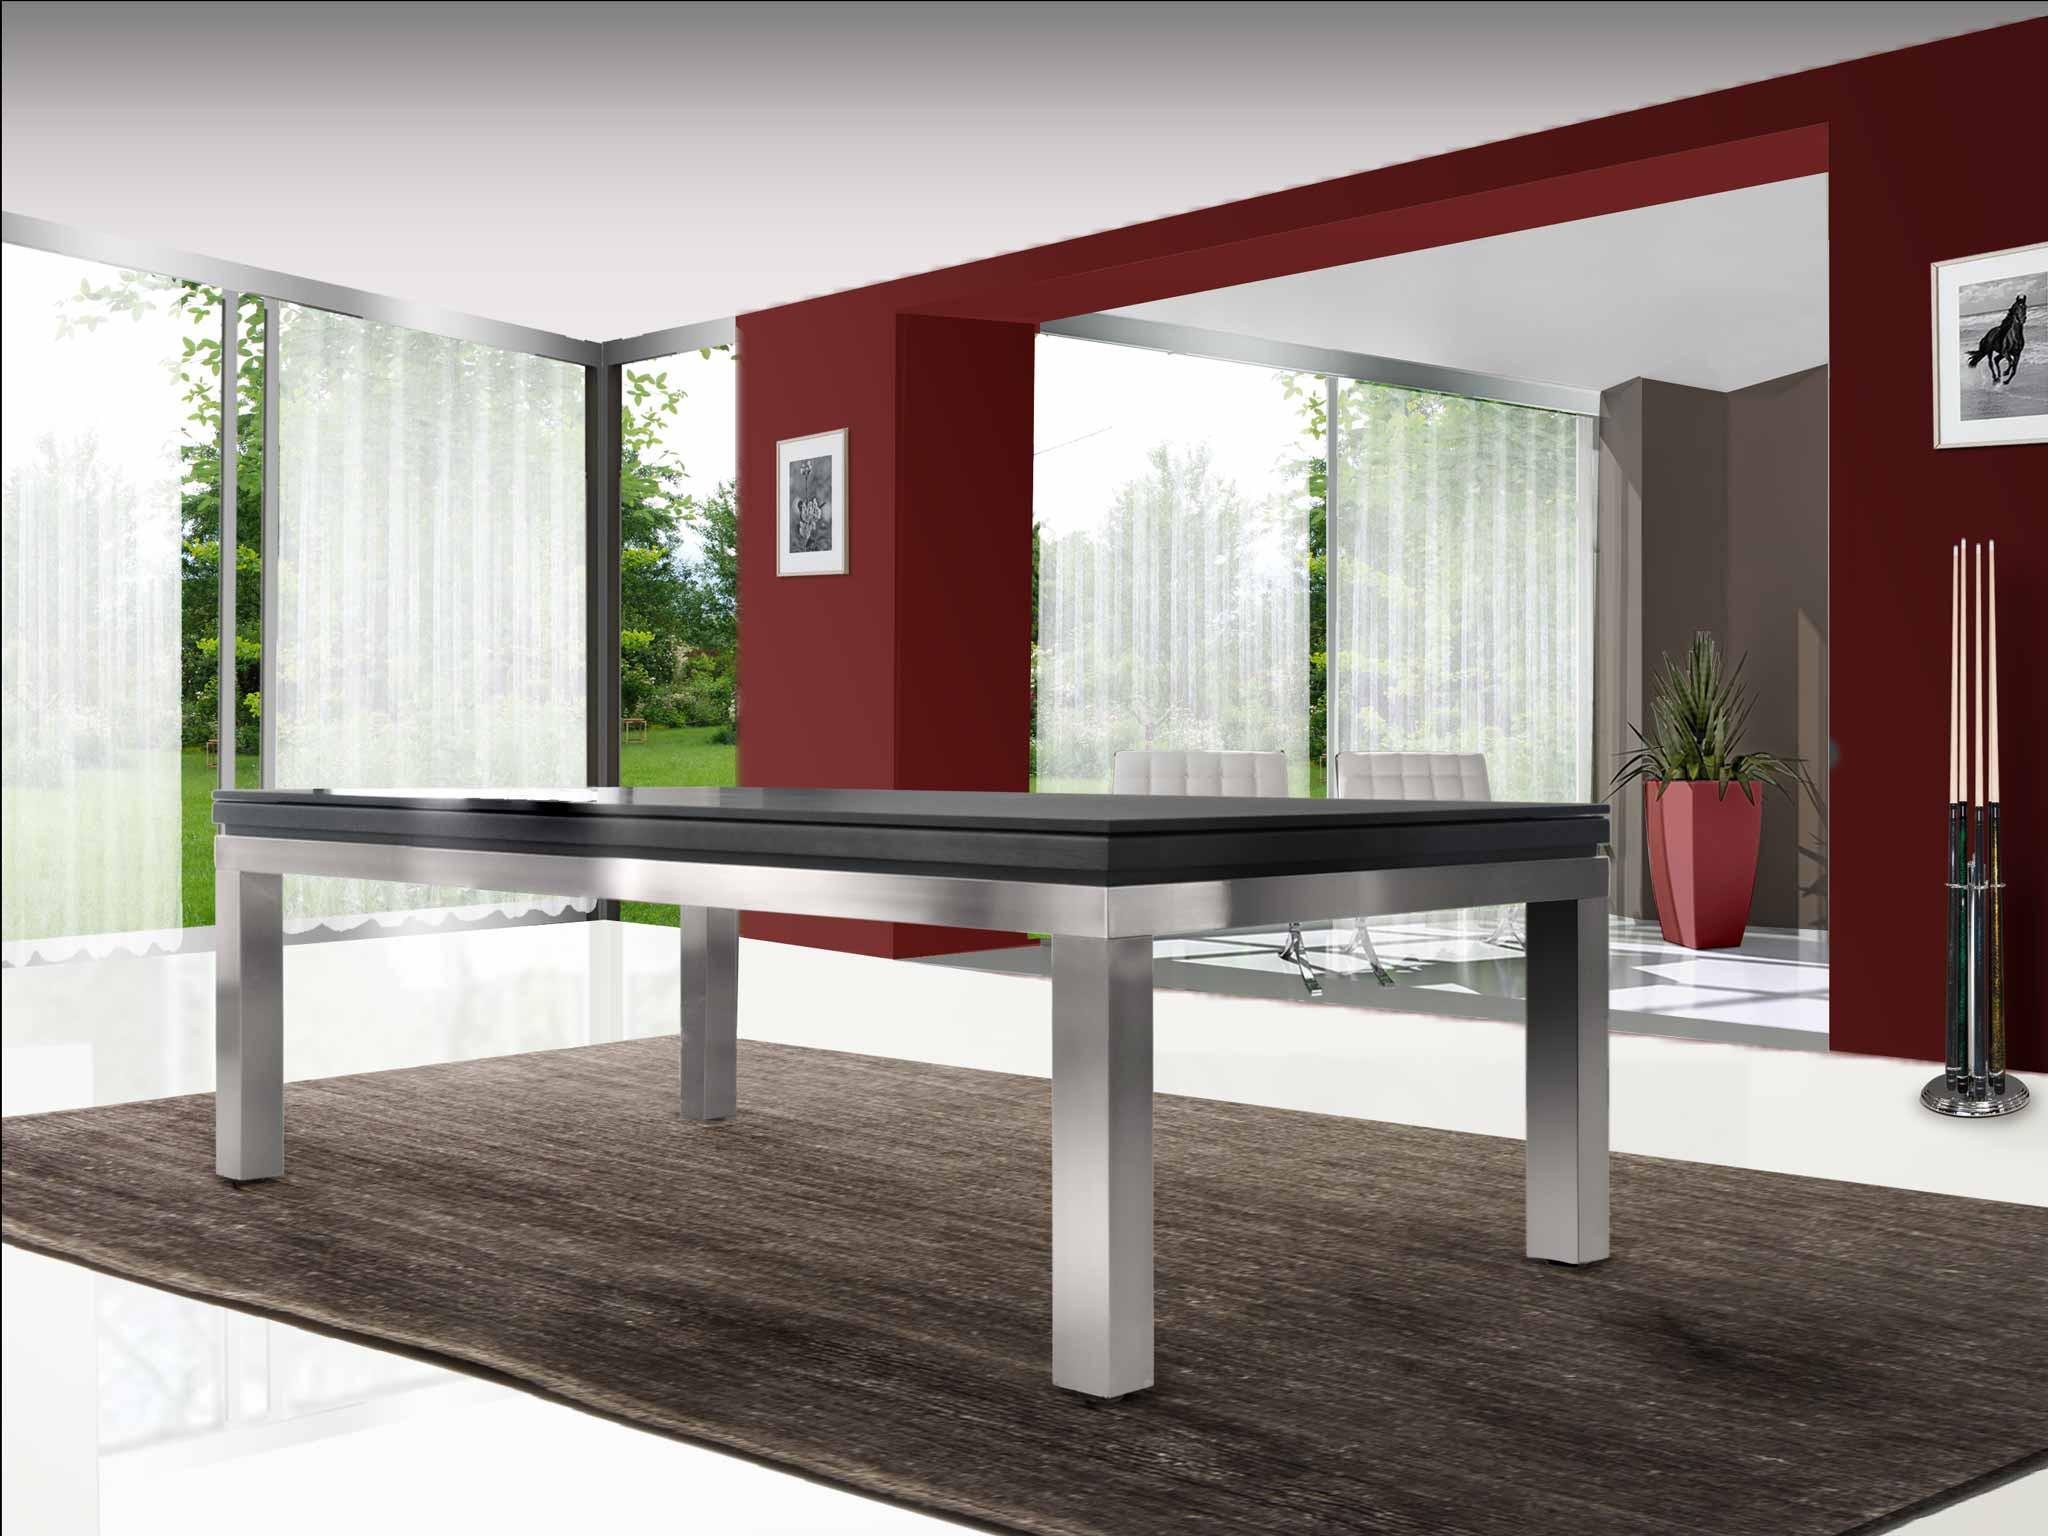 Billard NEW TENDANCE Table pieds Inox et cadre chêne anthracite - plateau ST